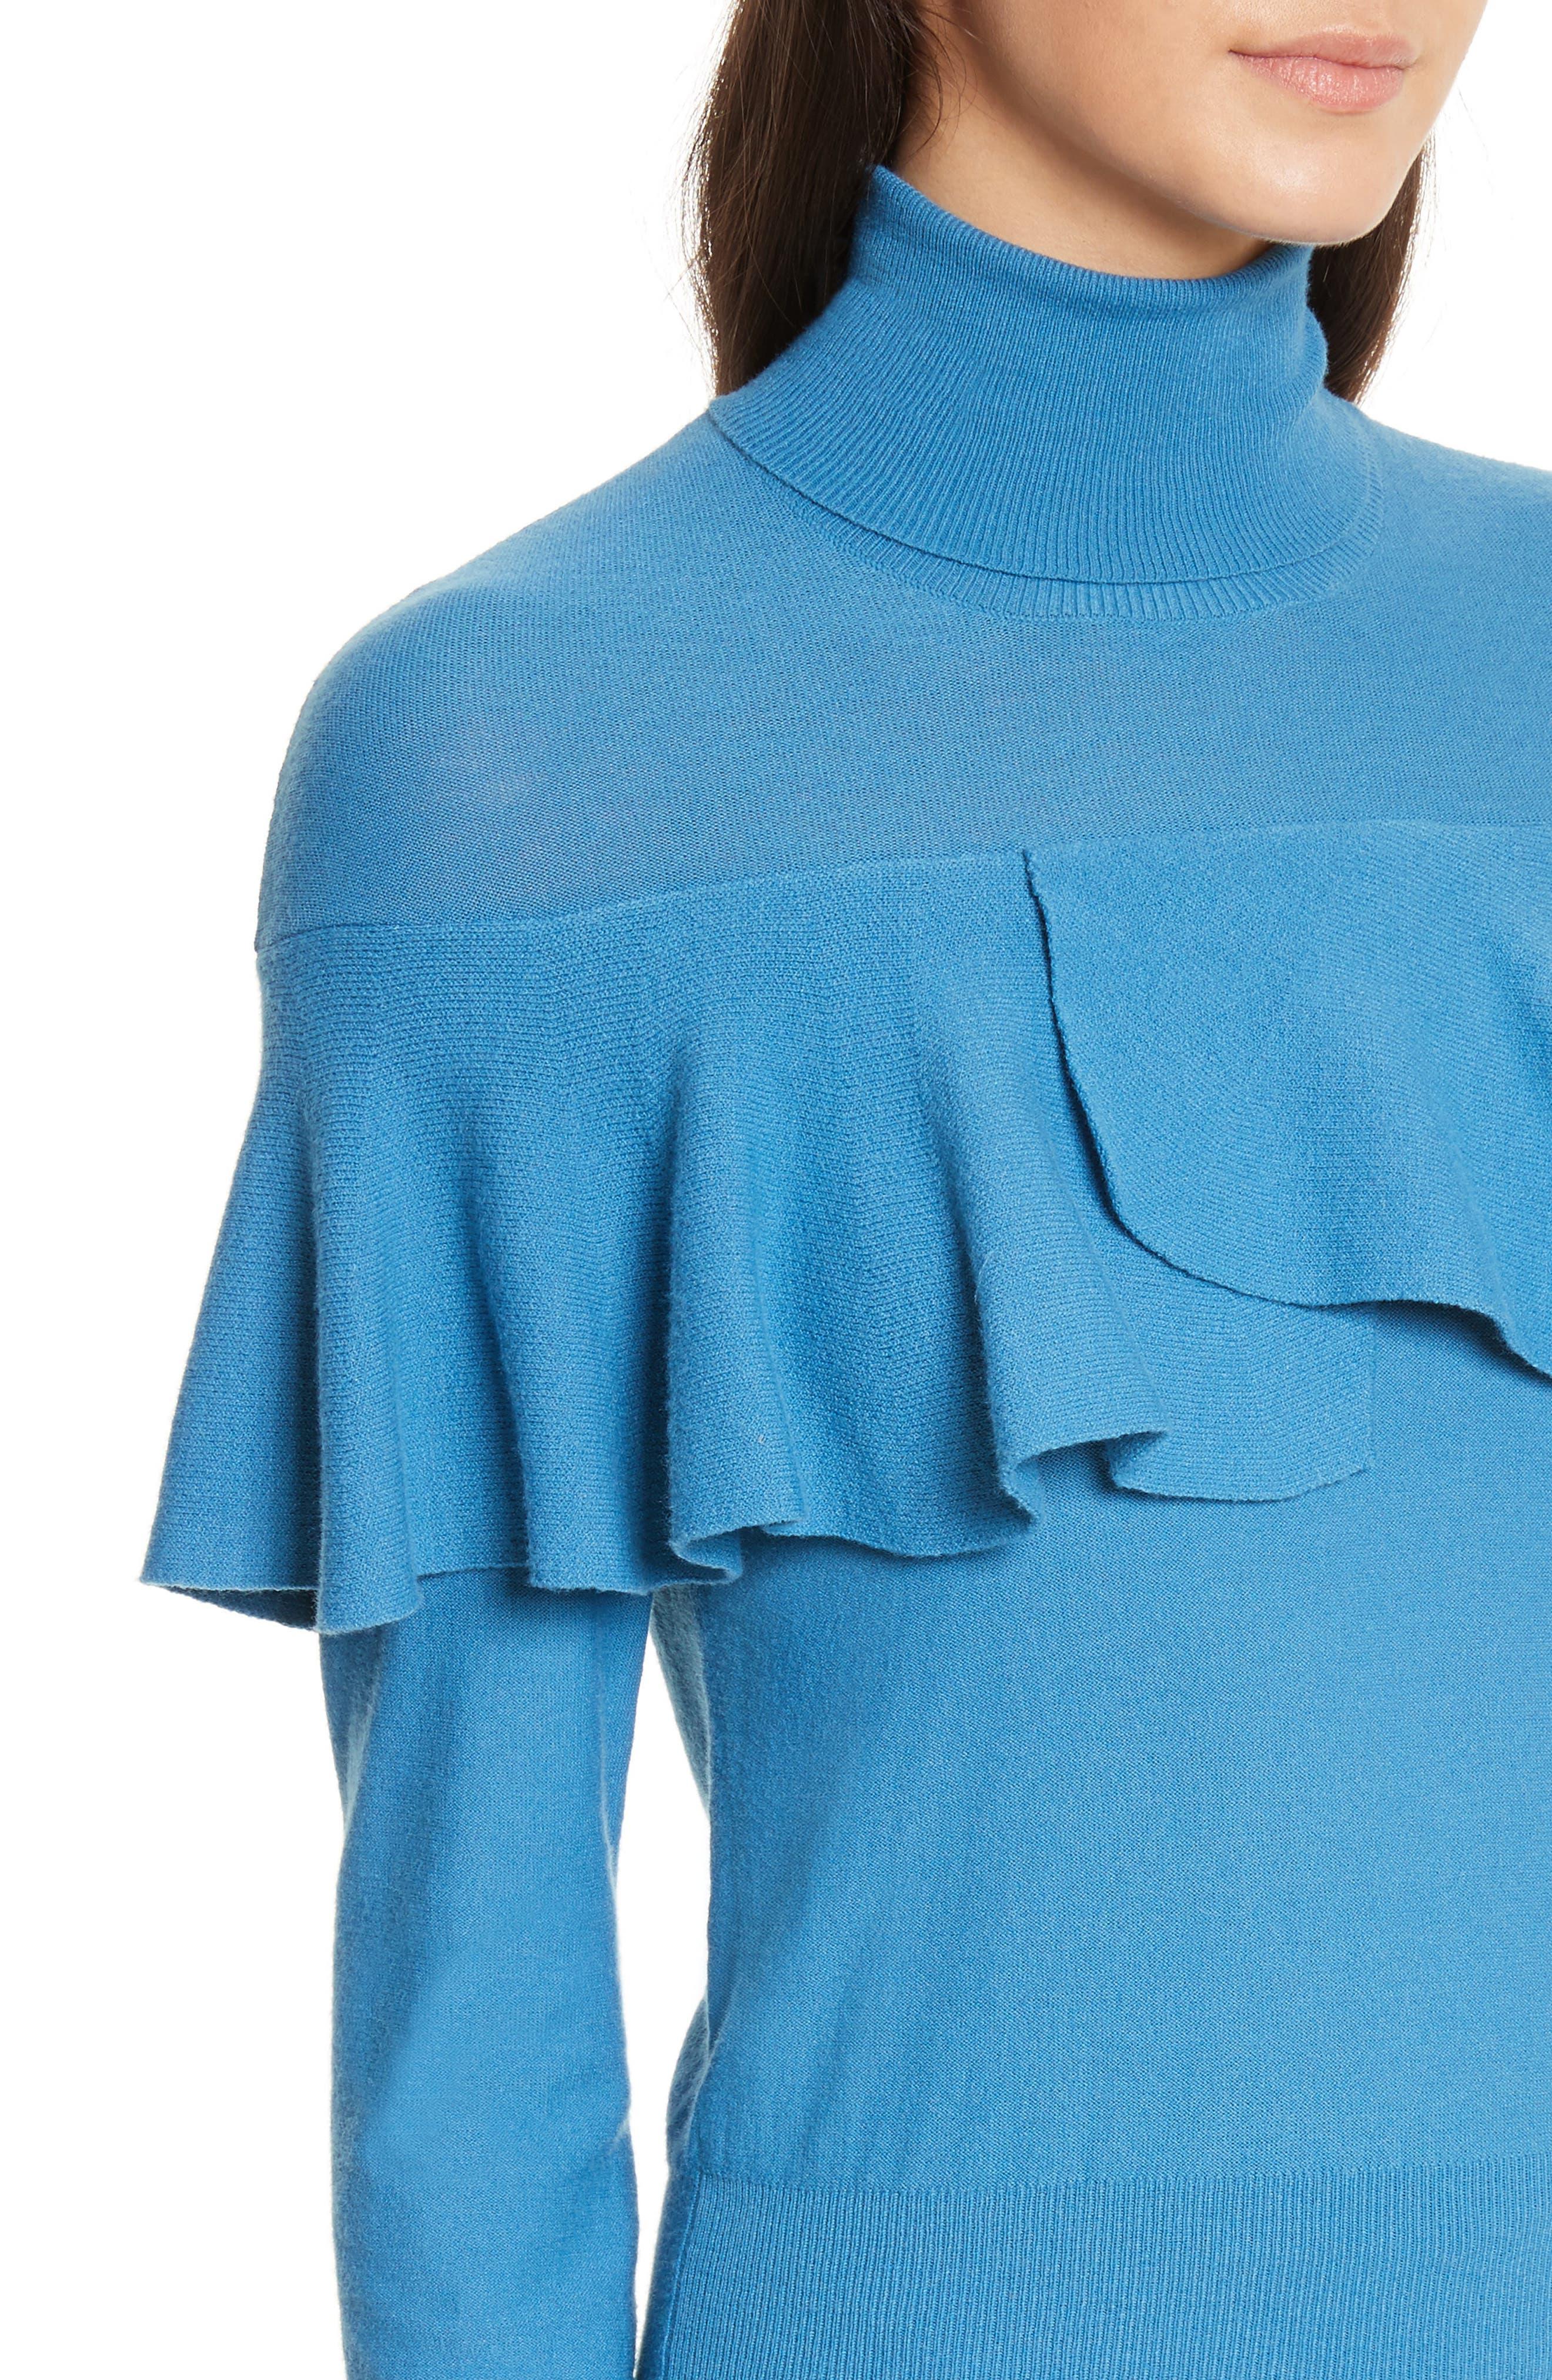 Flounced Turtleneck Sweater,                             Alternate thumbnail 4, color,                             487